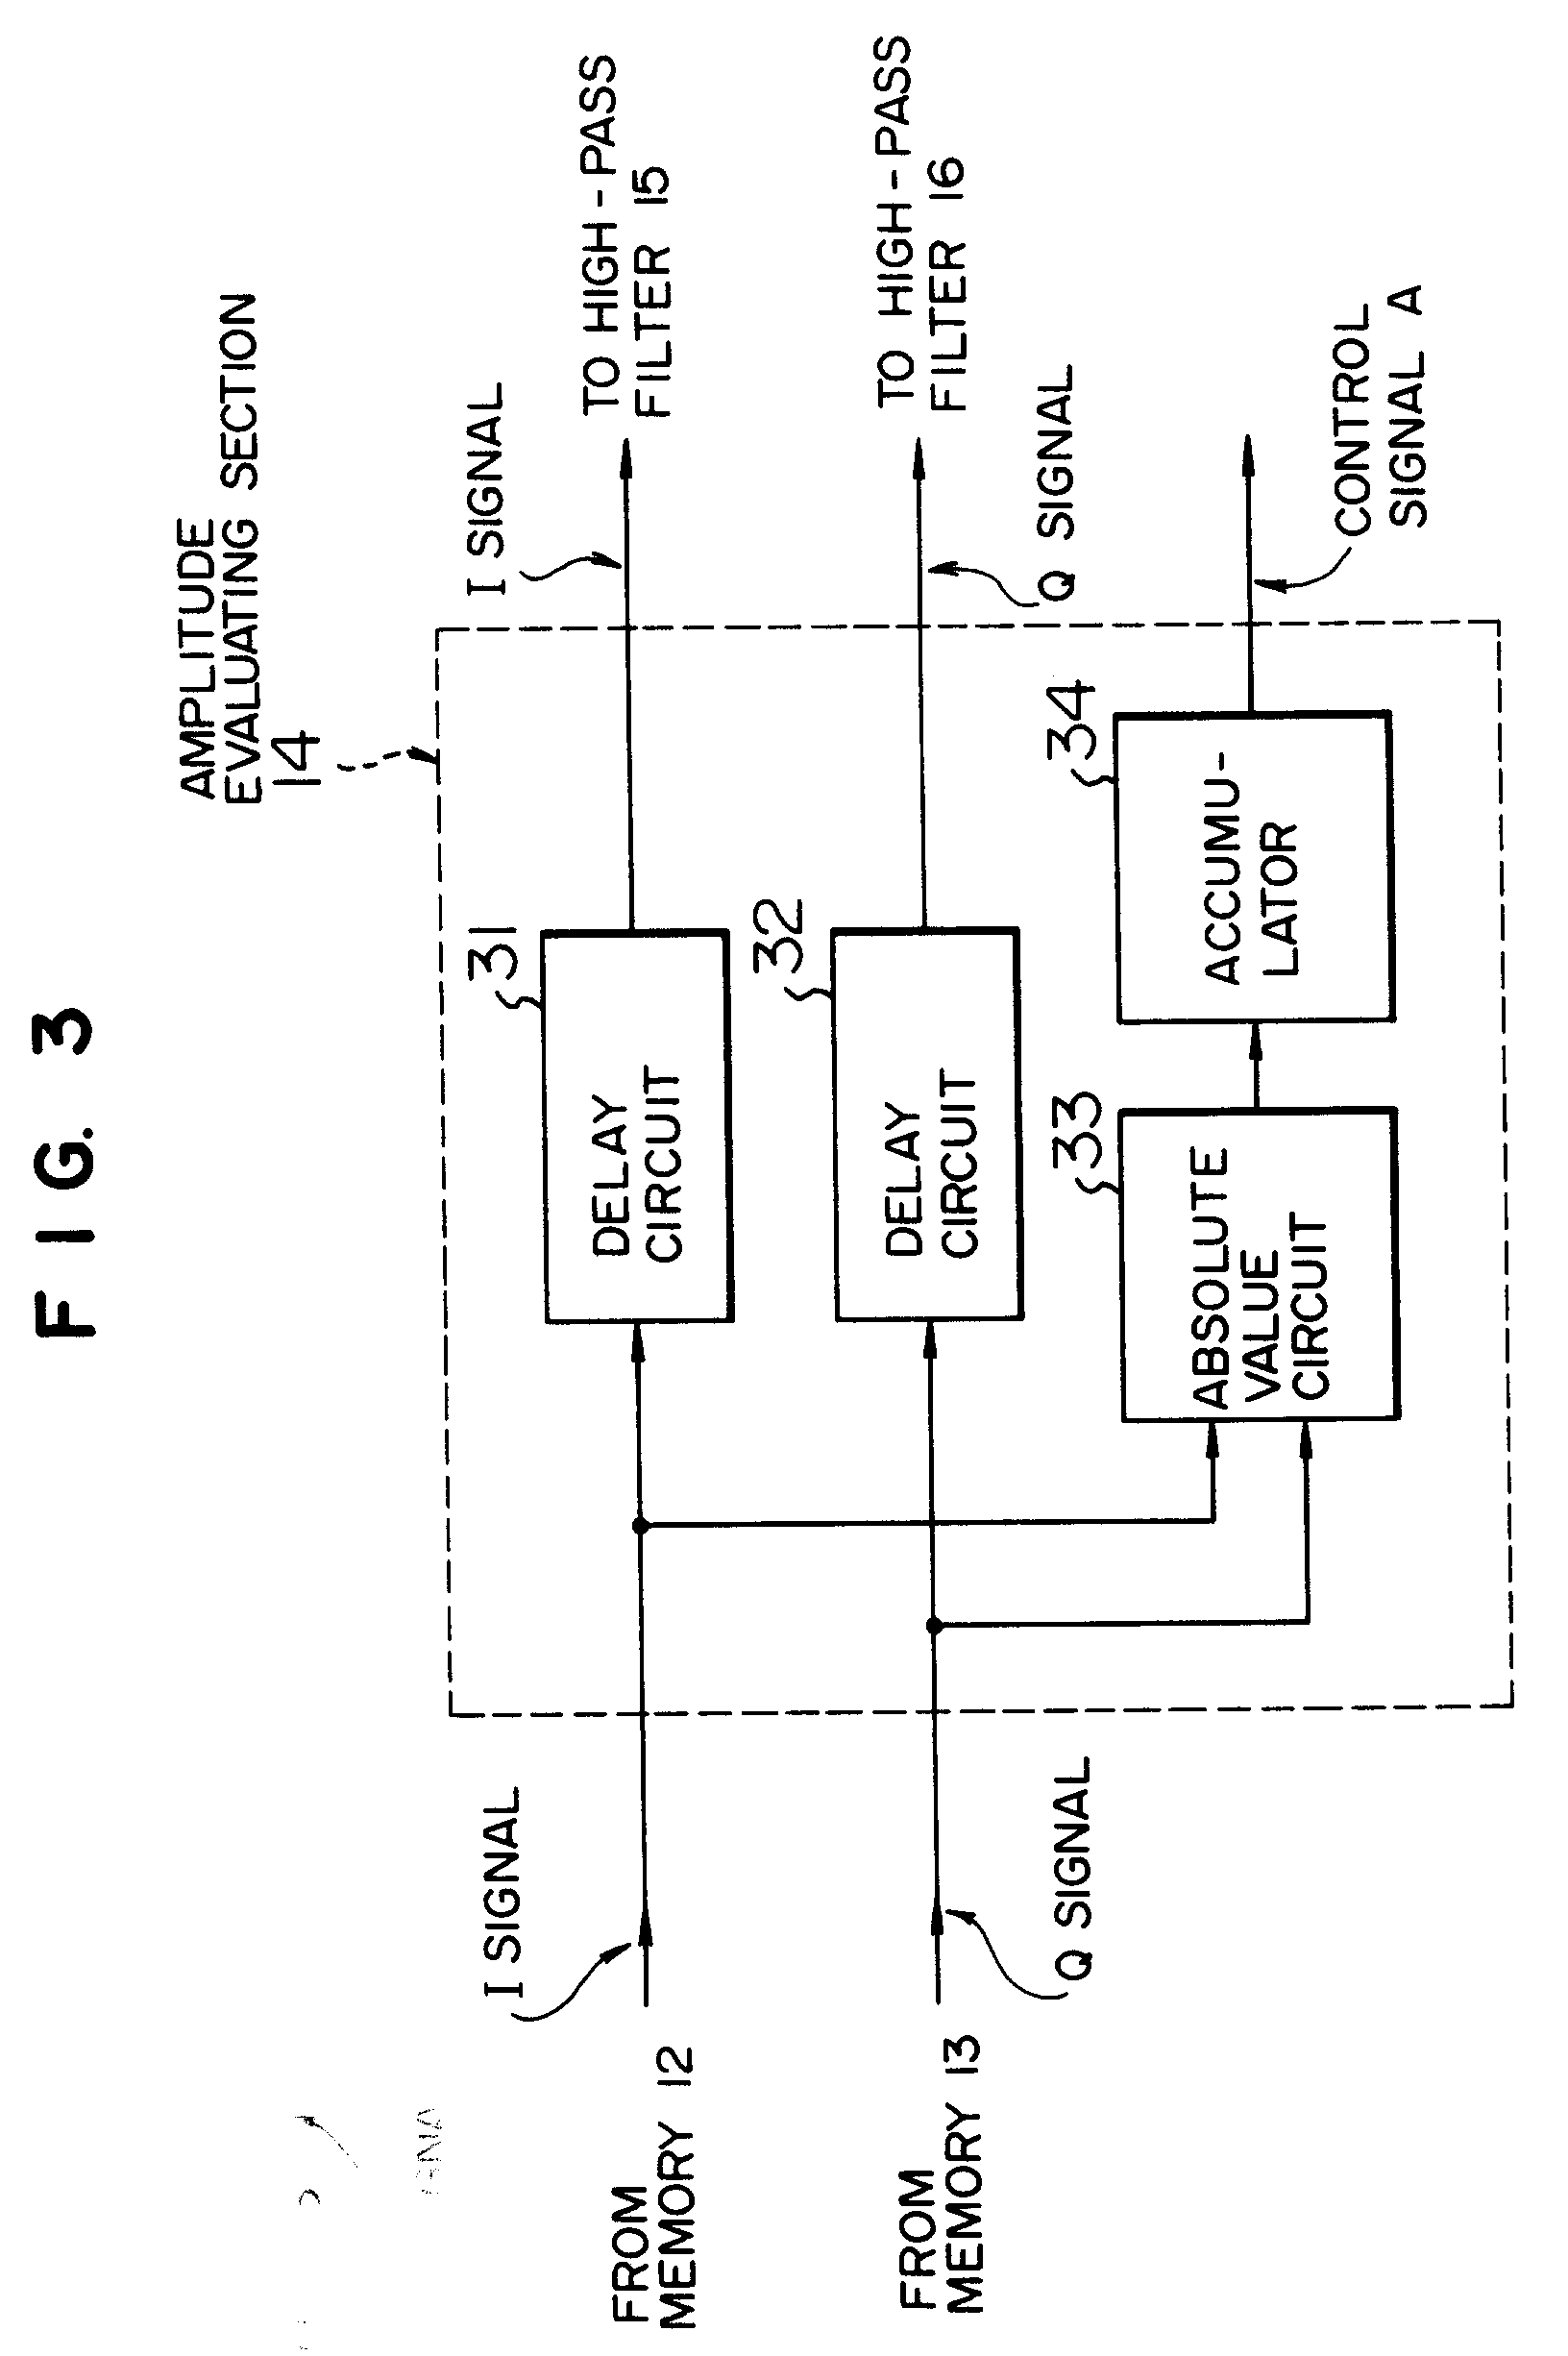 Patent Ep0524774b1 Ultrasonic Doppler Imaging Apparatus Google High Pass Filter Circuit Diagram Drawing